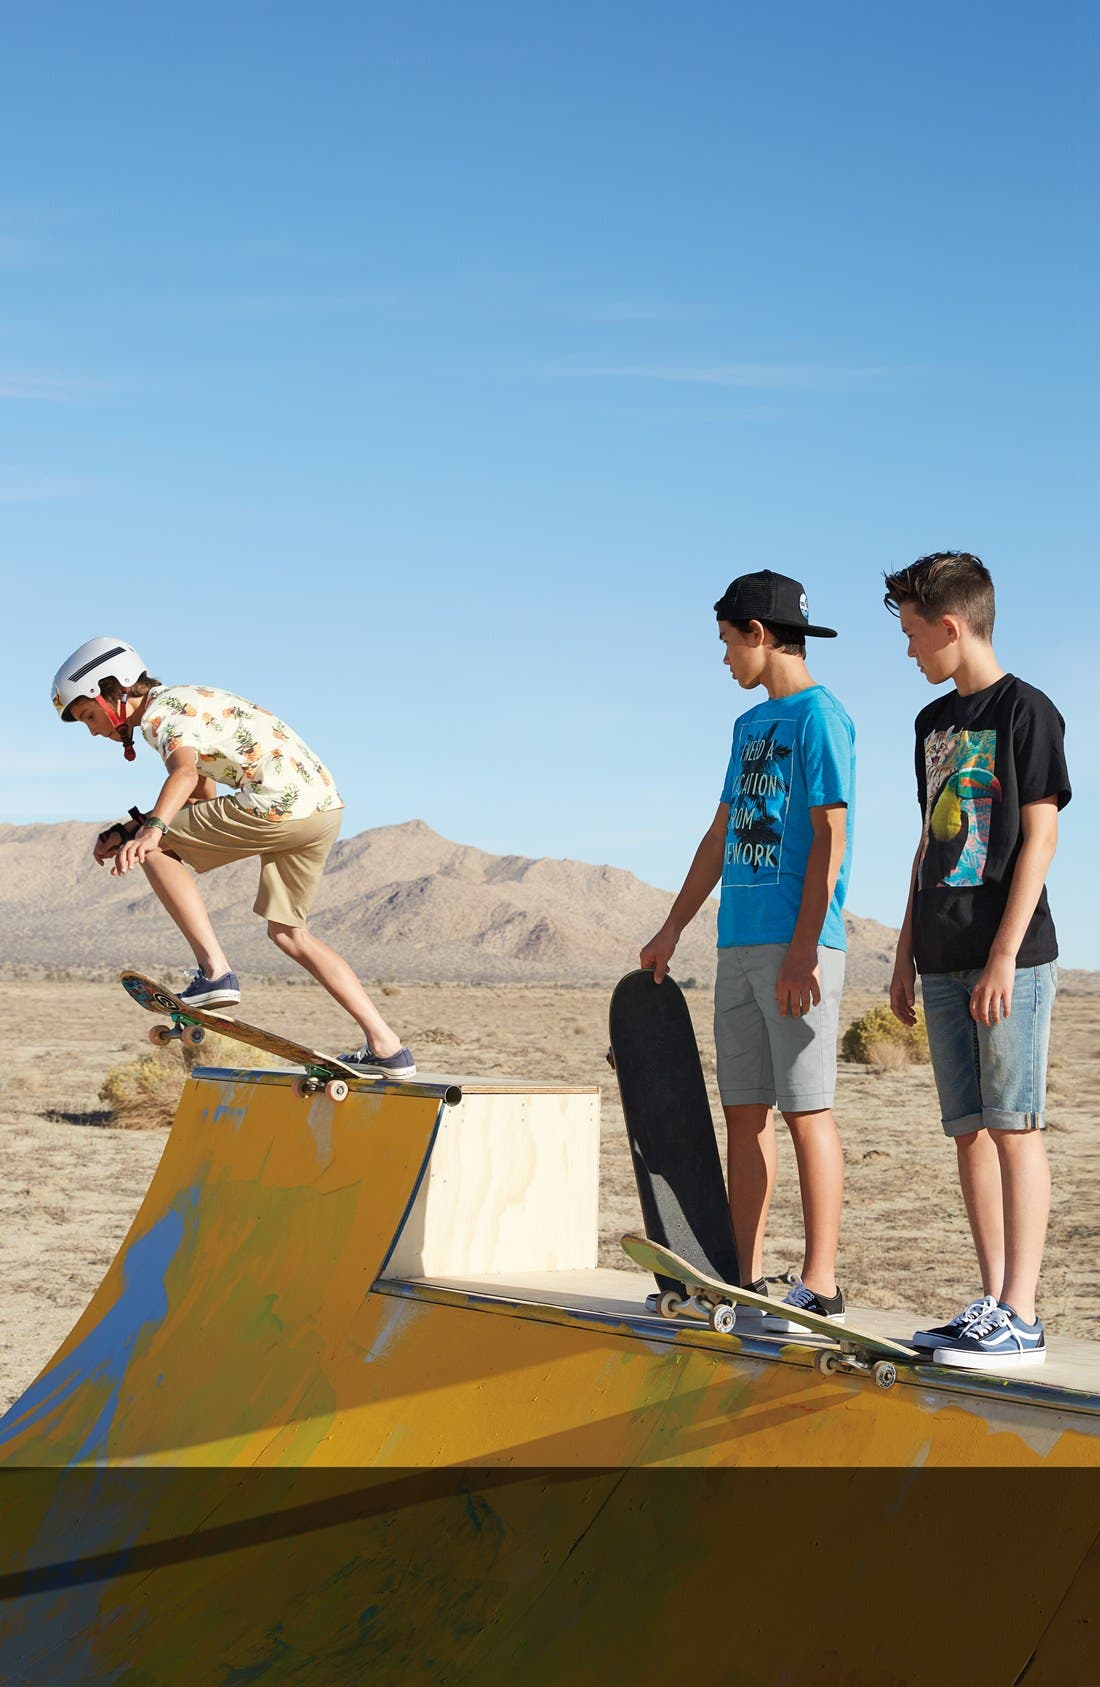 Alternate Image 2  - Tucker + Tate 'Stunt' Chino Shorts (Toddler Boys, Little Boys & Big Boys)